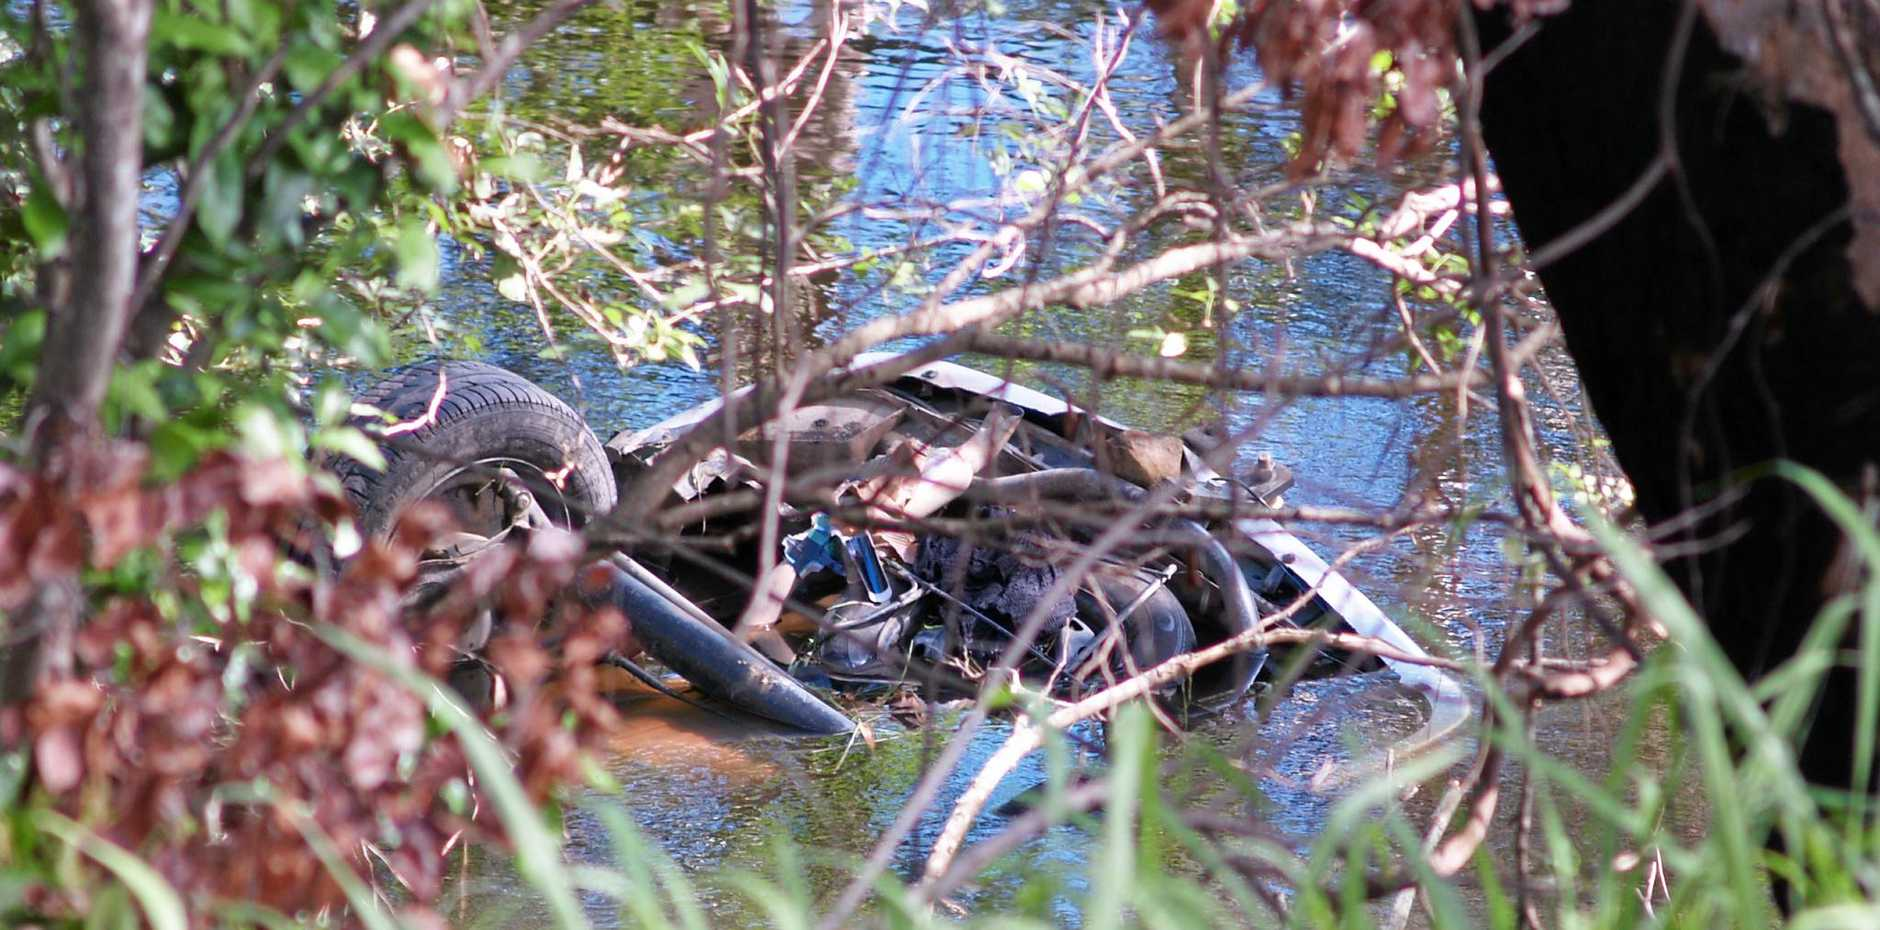 The crash occurred at Greta Creek, north of Proserpine.